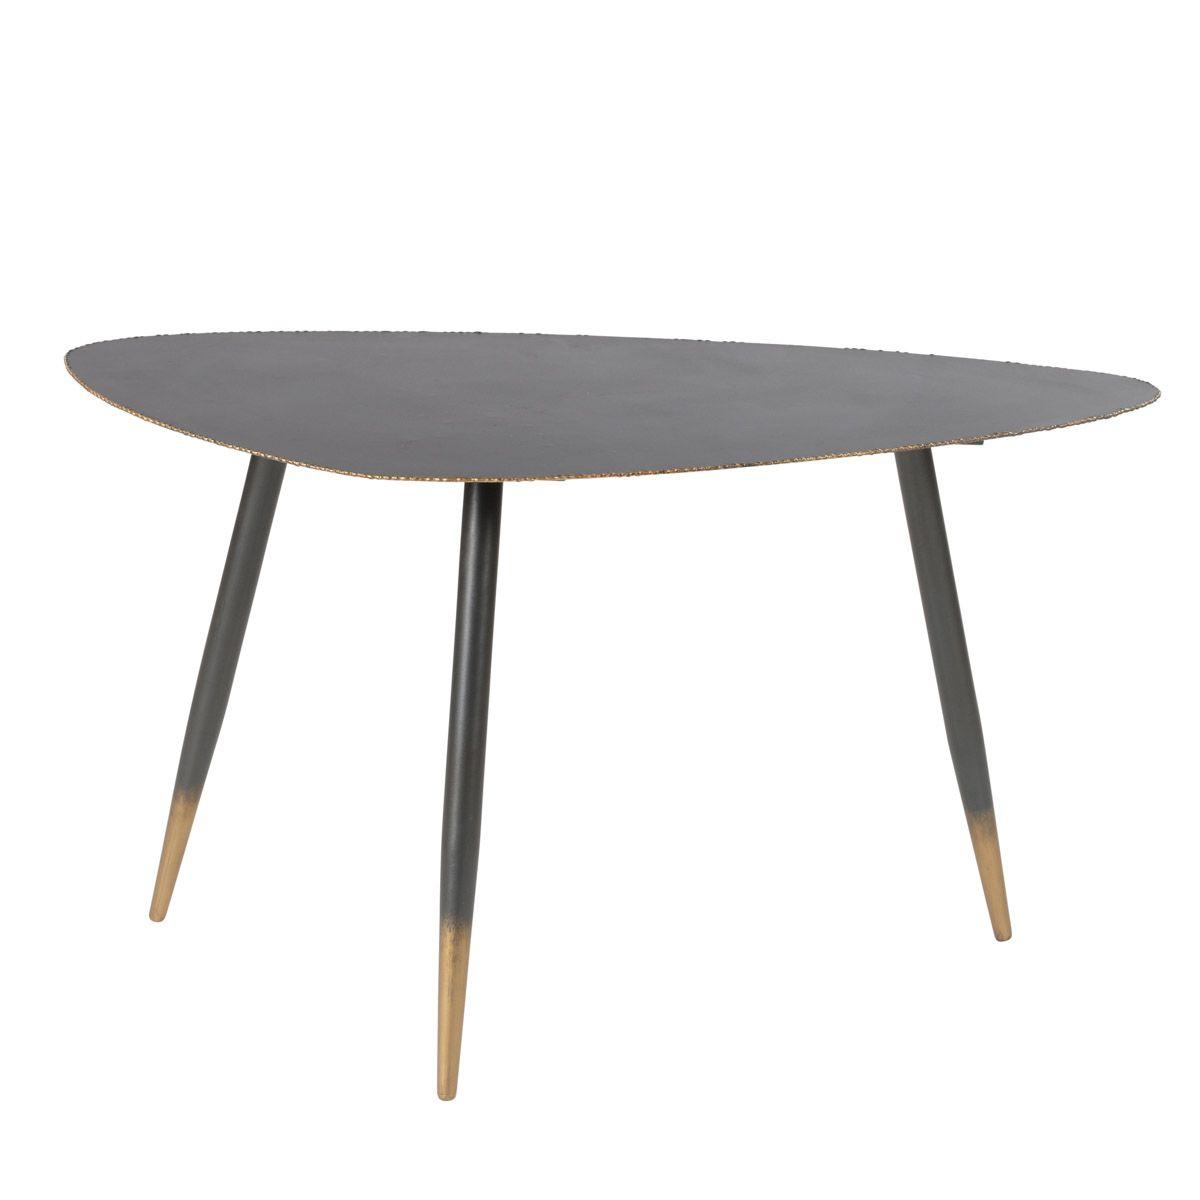 Table basse en métal 80 cm